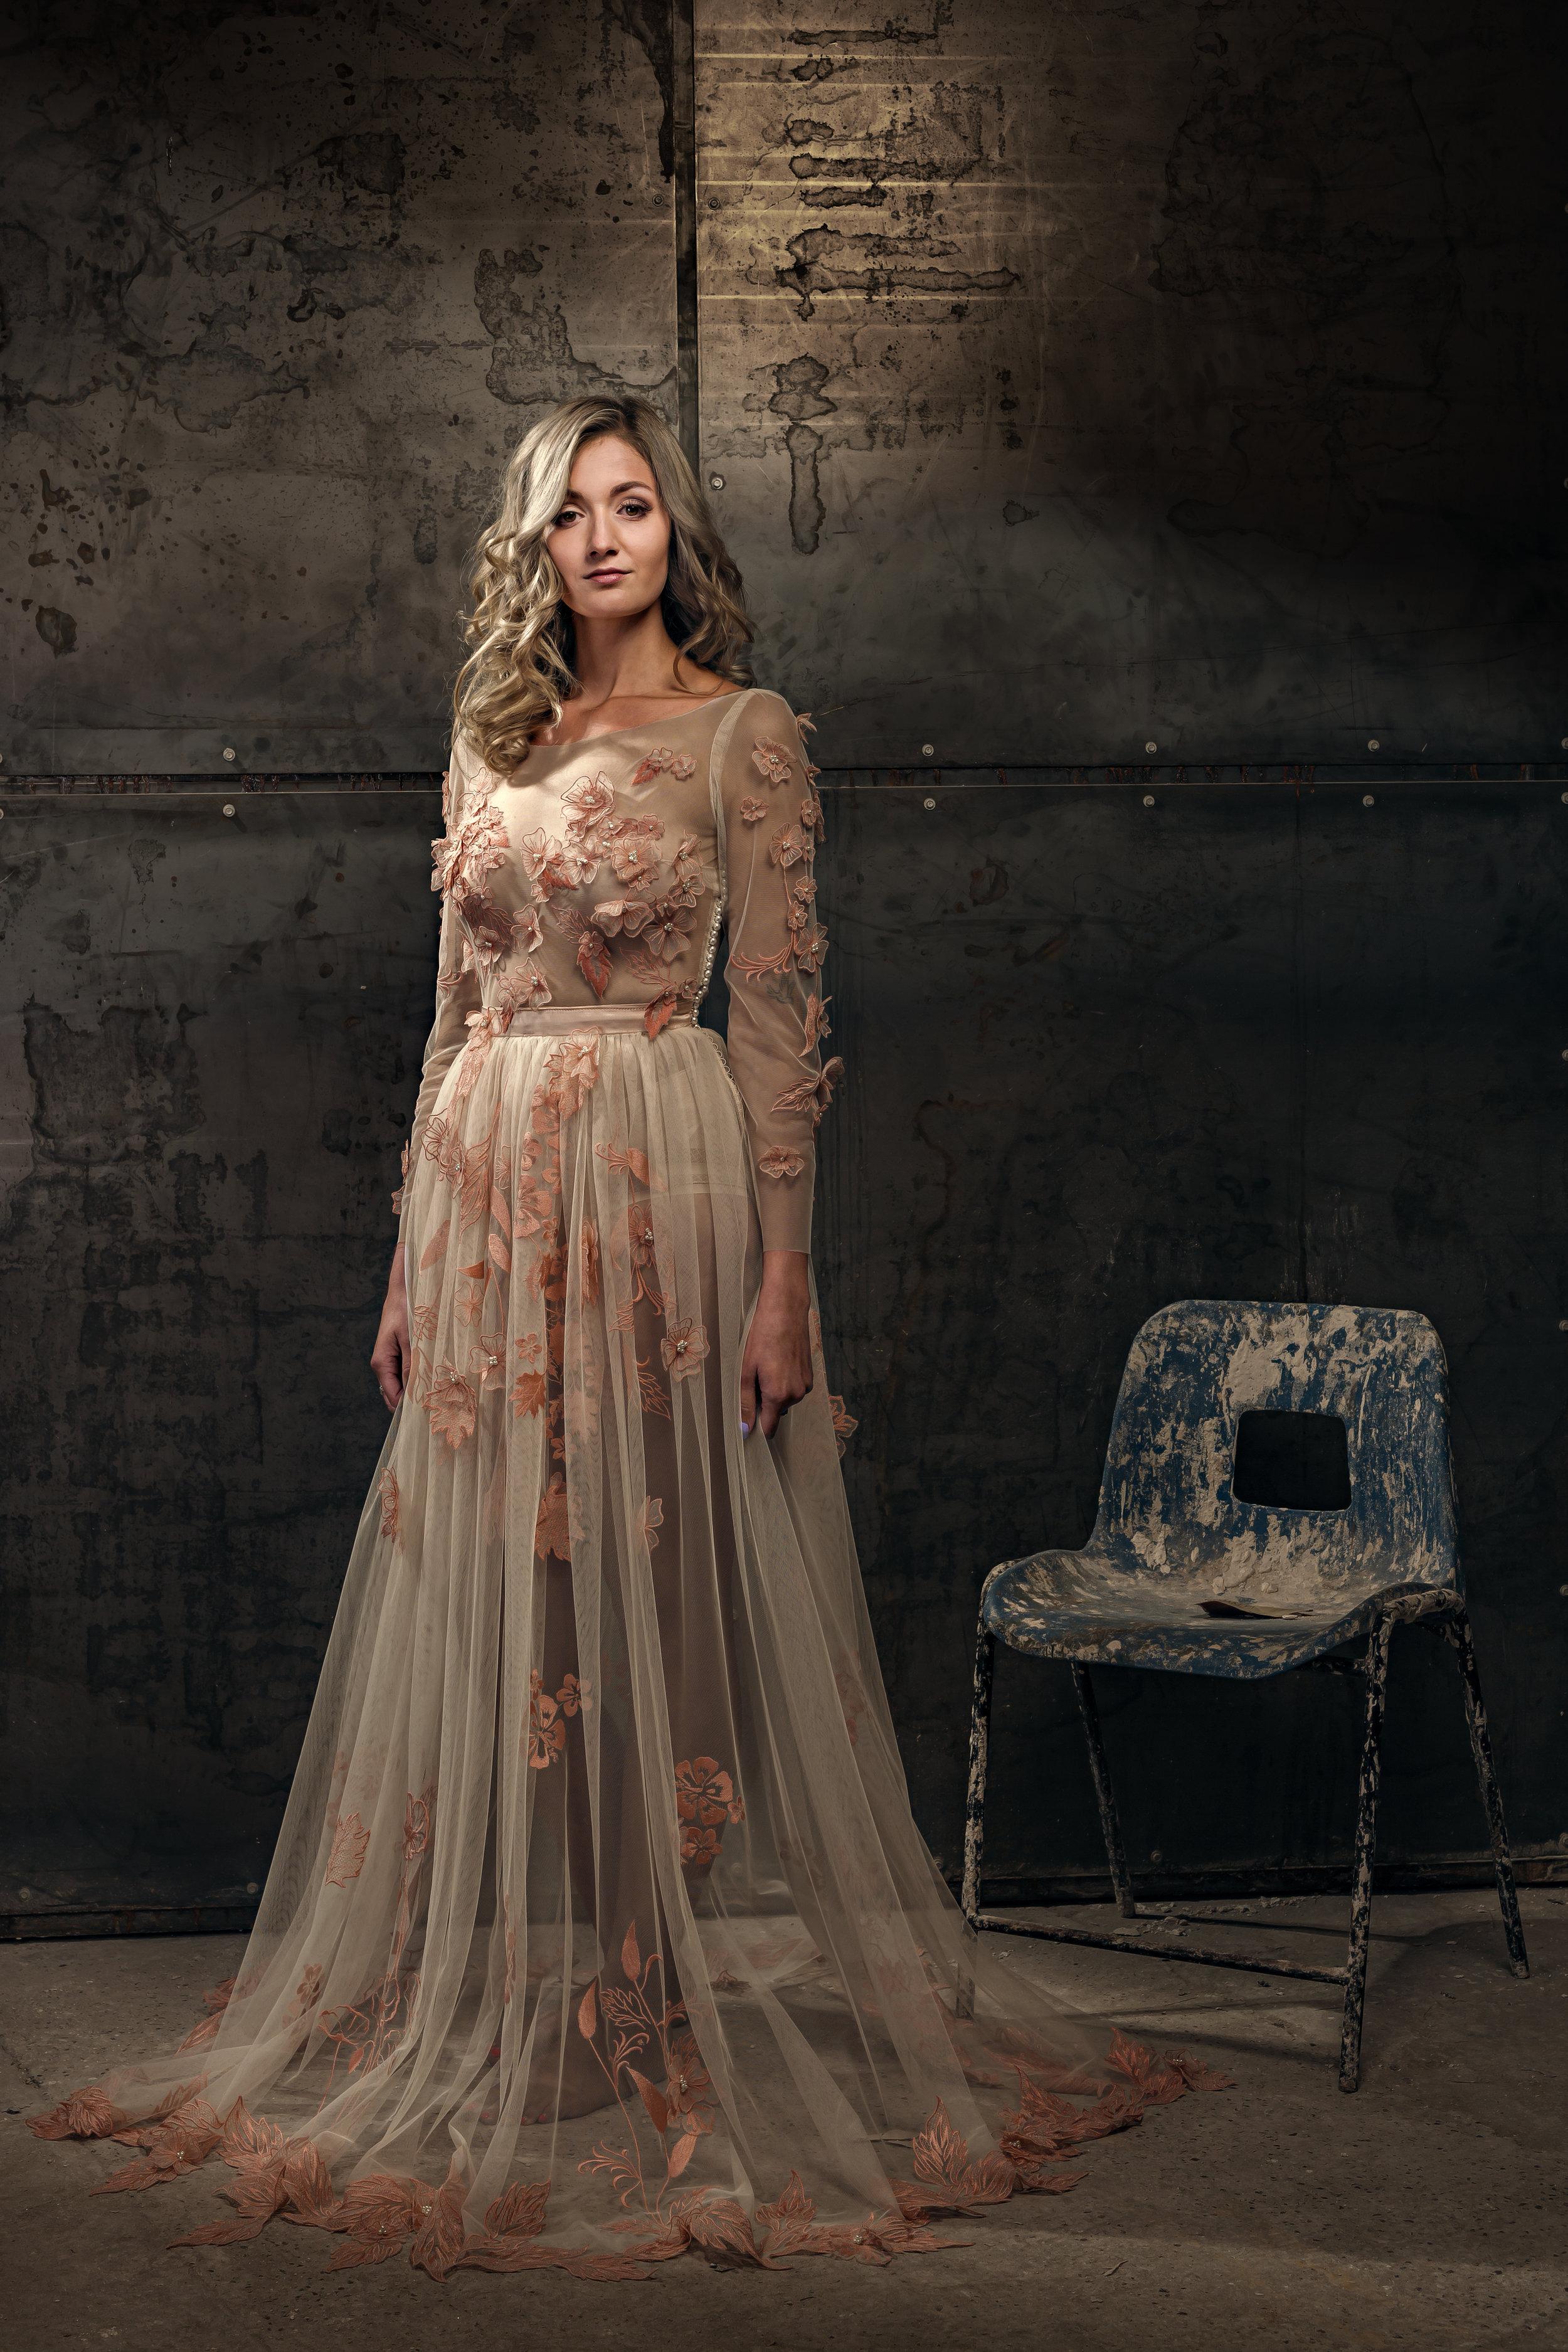 Martin Dobson Couture - Bespoke wedding dress - Suffolk - 0110 - September 17, 2017 - copyright Foyers Photography-Edit--® Robert Foyers - All Rights Reserved-3682 x 5524.JPG